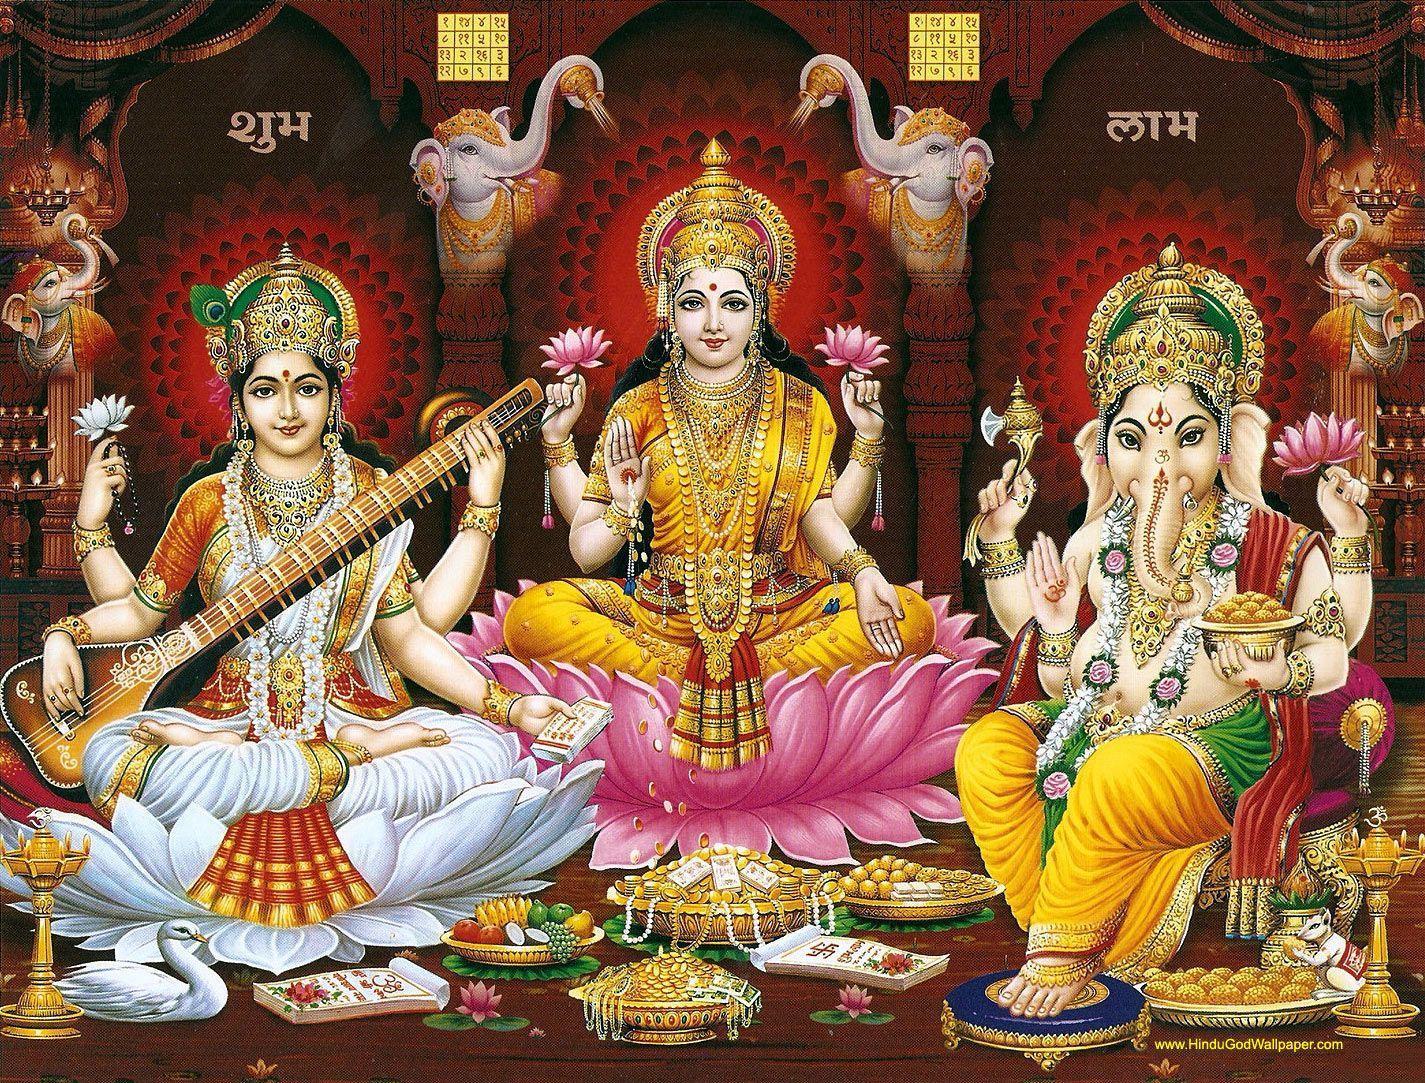 Laxmi Ganesh Saraswati Wallpapers Top Free Laxmi Ganesh Saraswati Backgrounds Wallpaperaccess